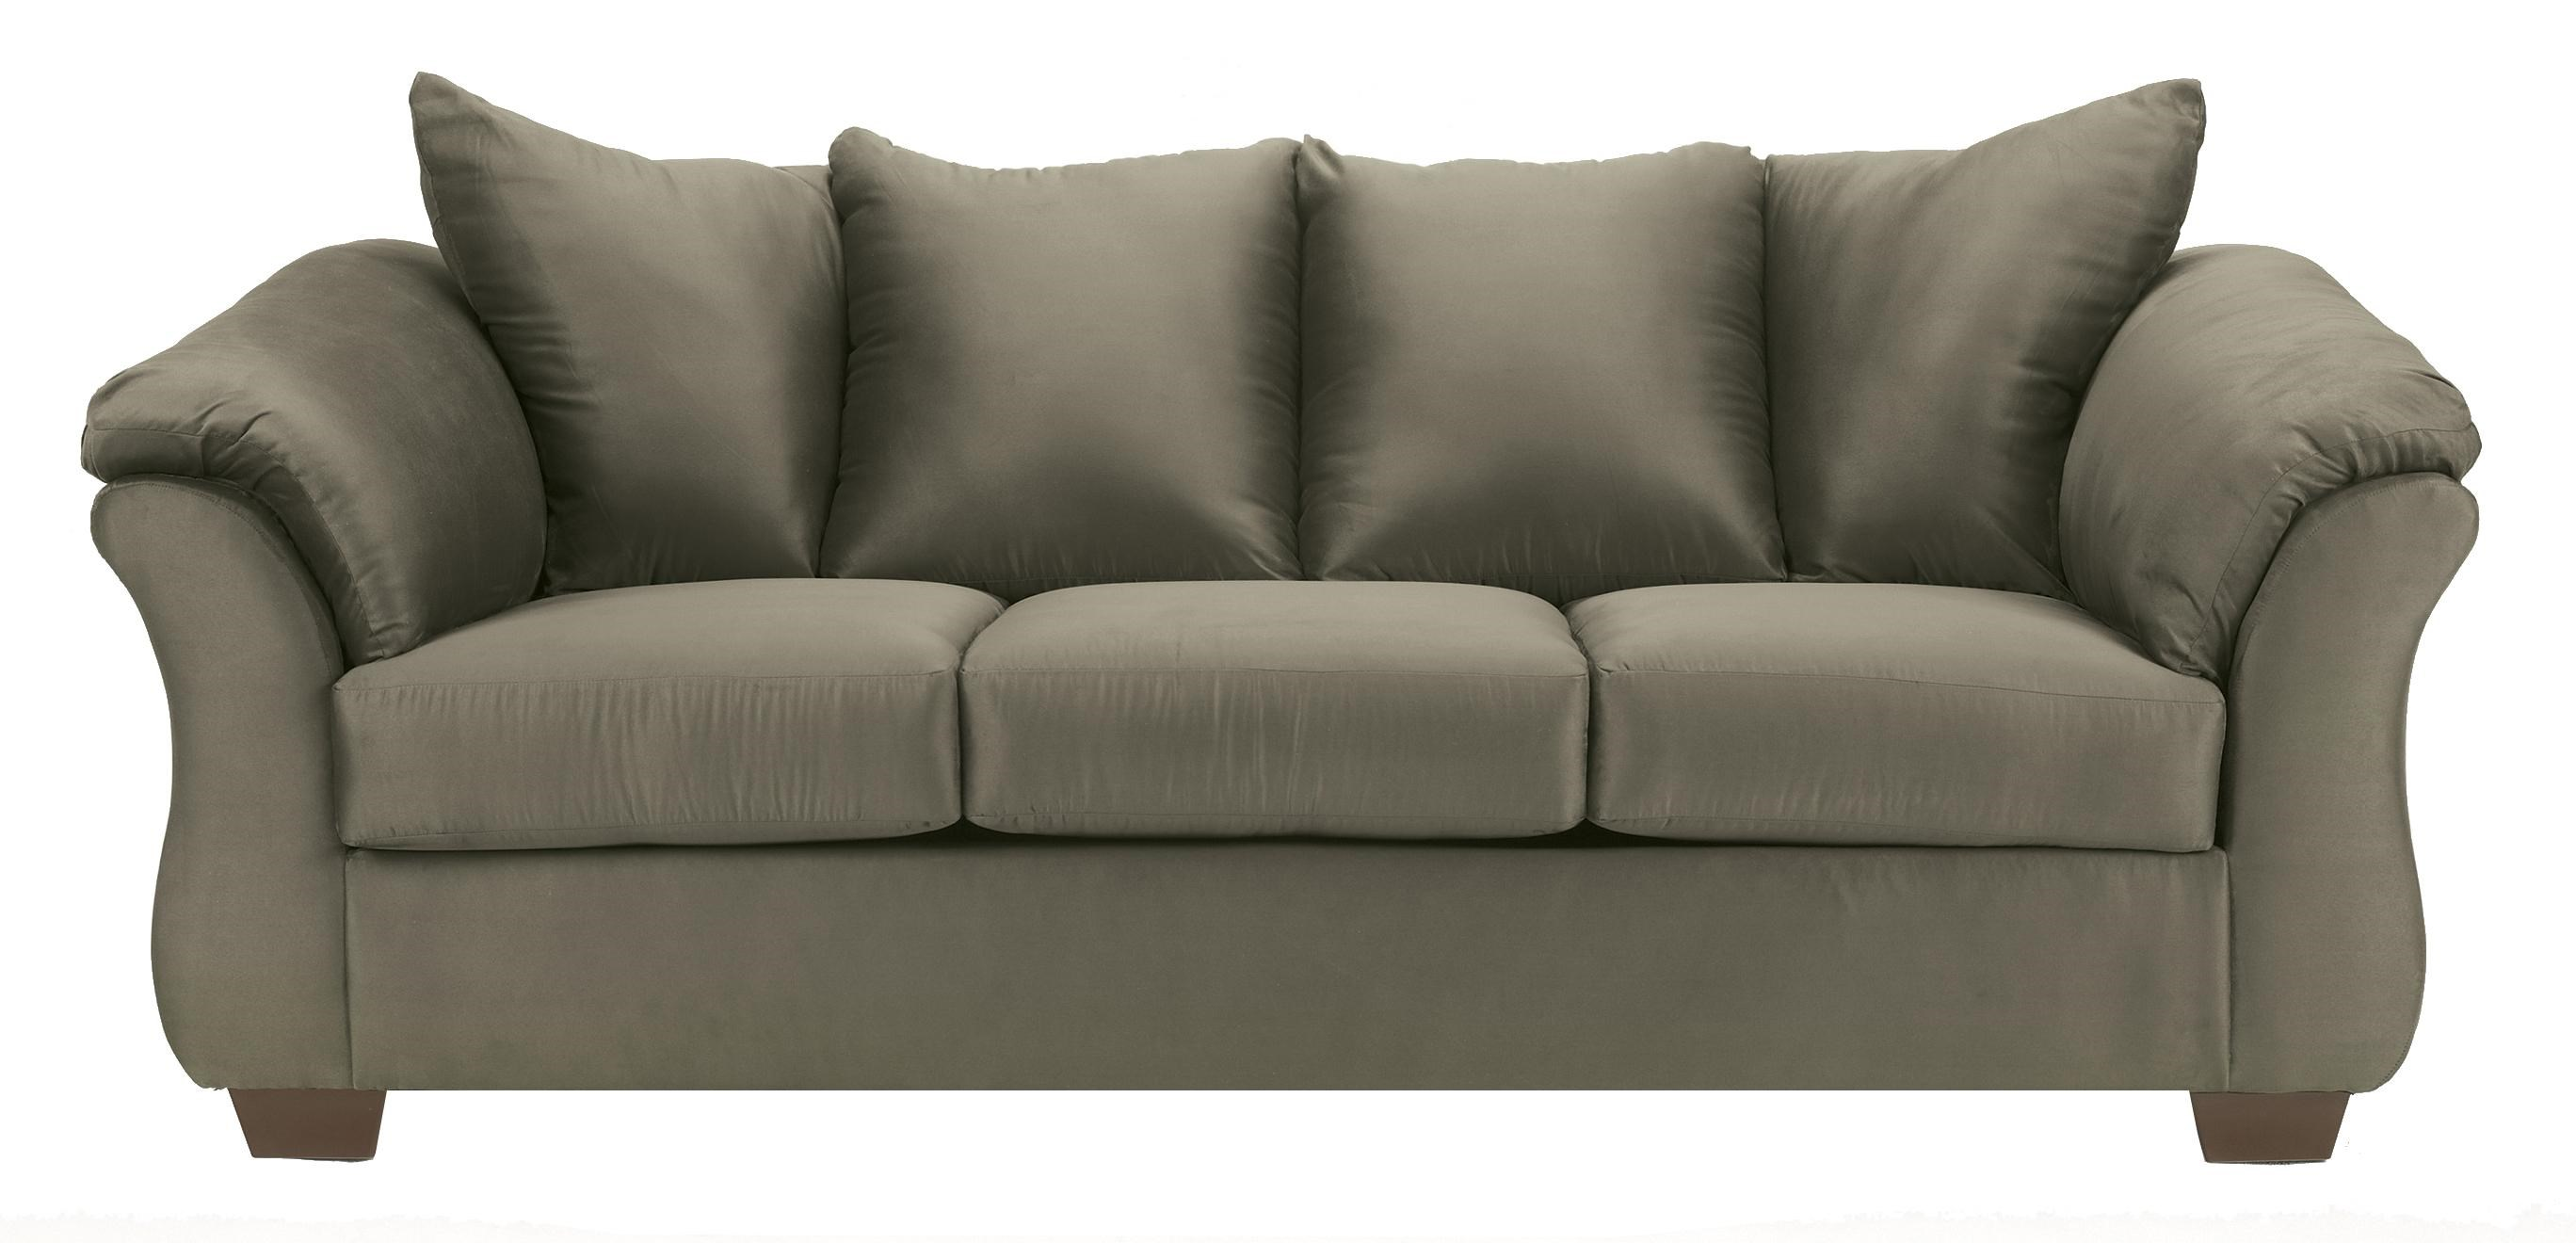 Ordinaire Signature Design By Ashley Darcy   SageStationary Sofa ...